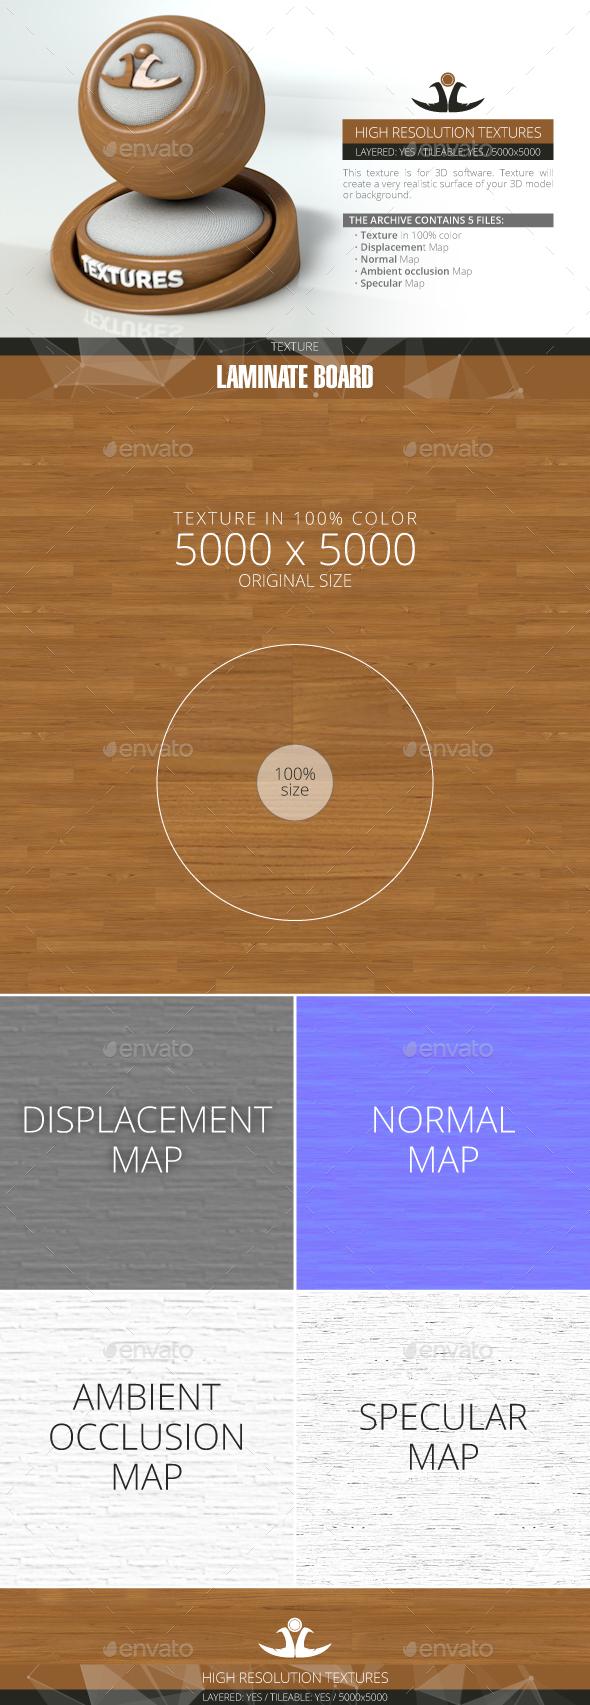 Laminate Board 81 - 3DOcean Item for Sale